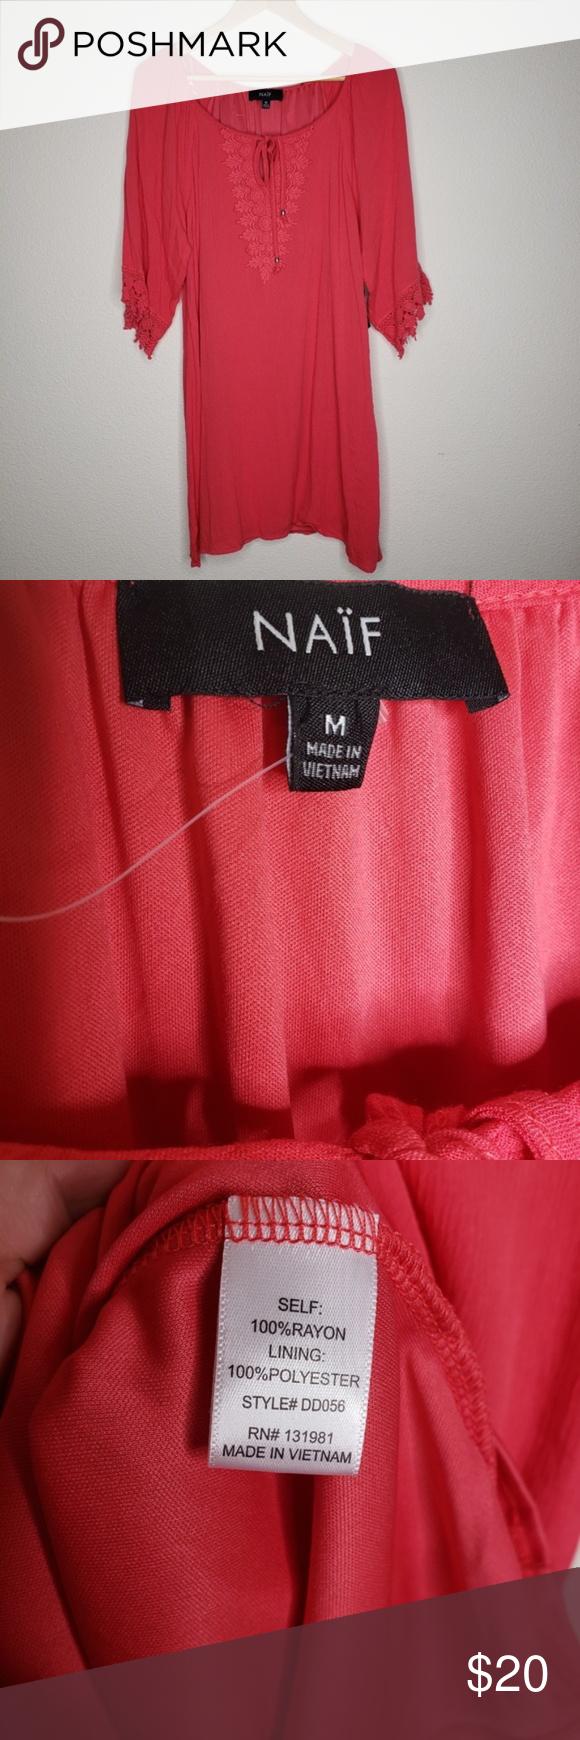 Naif Hot Pink Neck Tie Crepe Dress Naif Hot Pink Neck Tie Crepe Dress Tied neckline, embroidered front crepe material short sleeves with woven embelli…